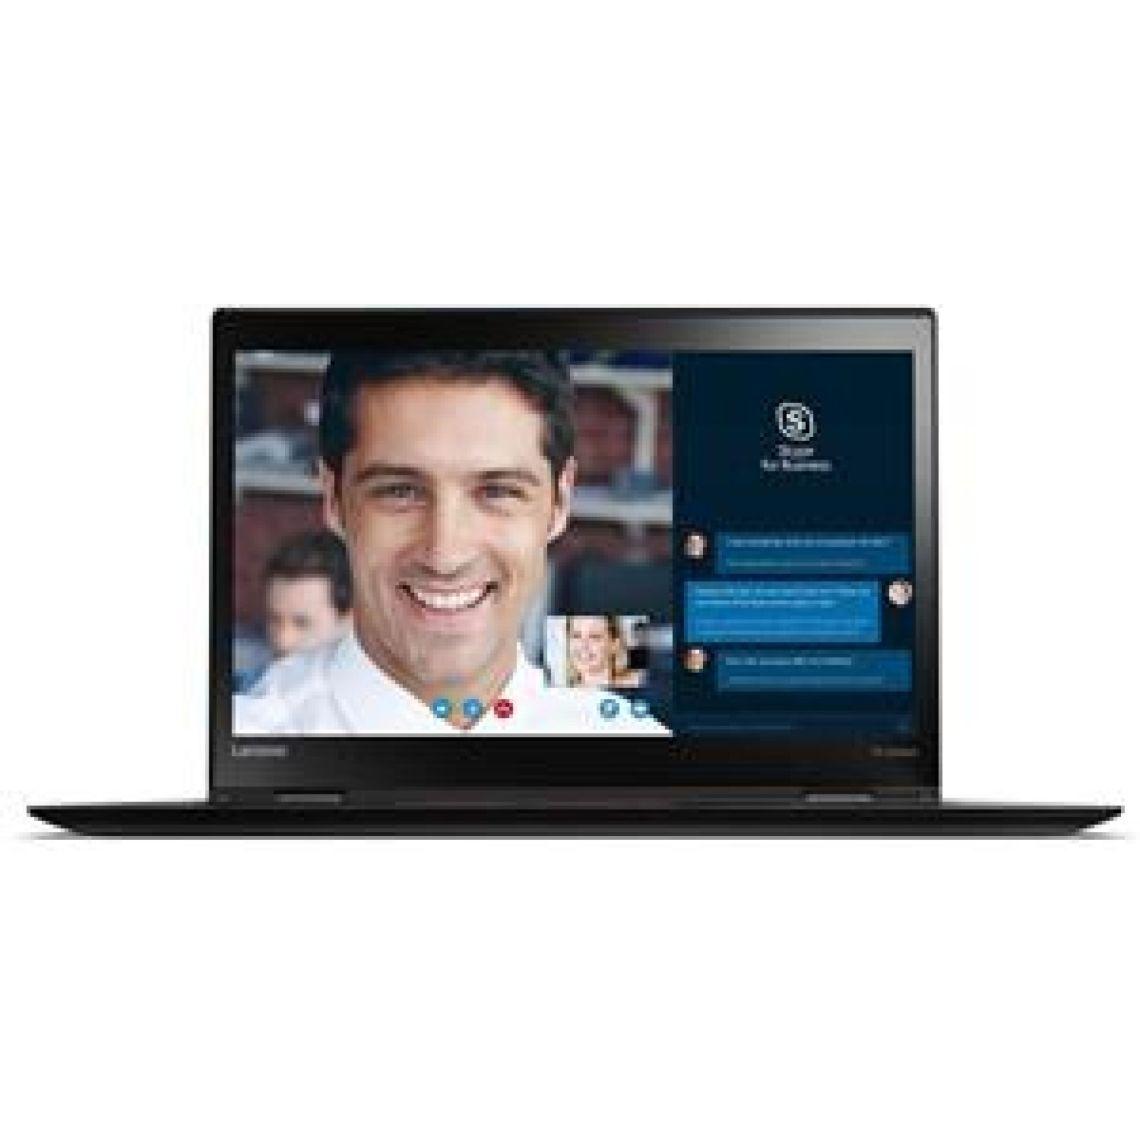 "Lenovo ThinkPad X1 Carbon 14"", i7-6600U 2.60GHz, 8GB, 512GB SSD, W10P"